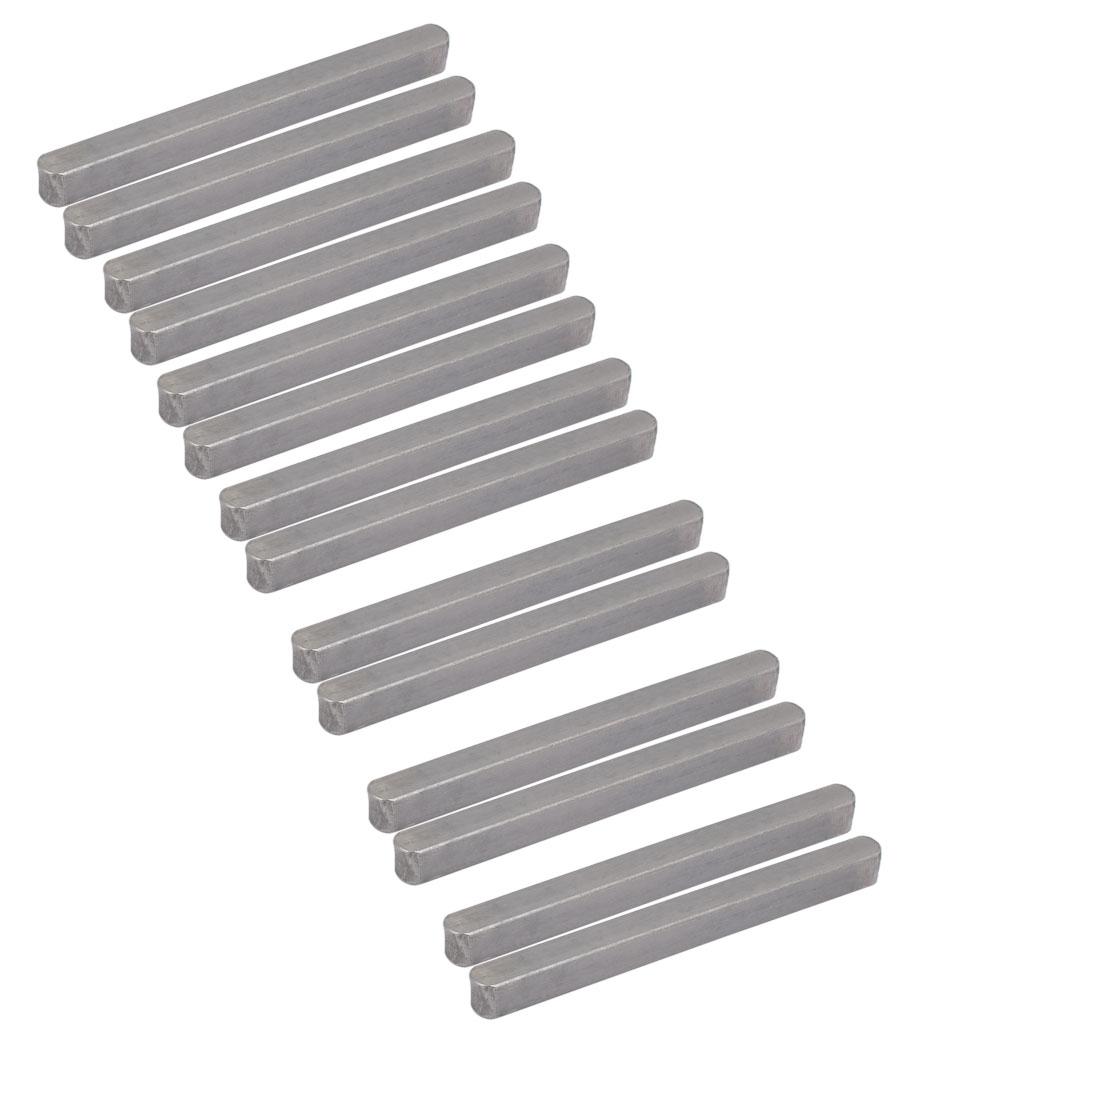 70mmx6mmx6mm Carbon Steel Key Stock To Lock Pulleys 14pcs